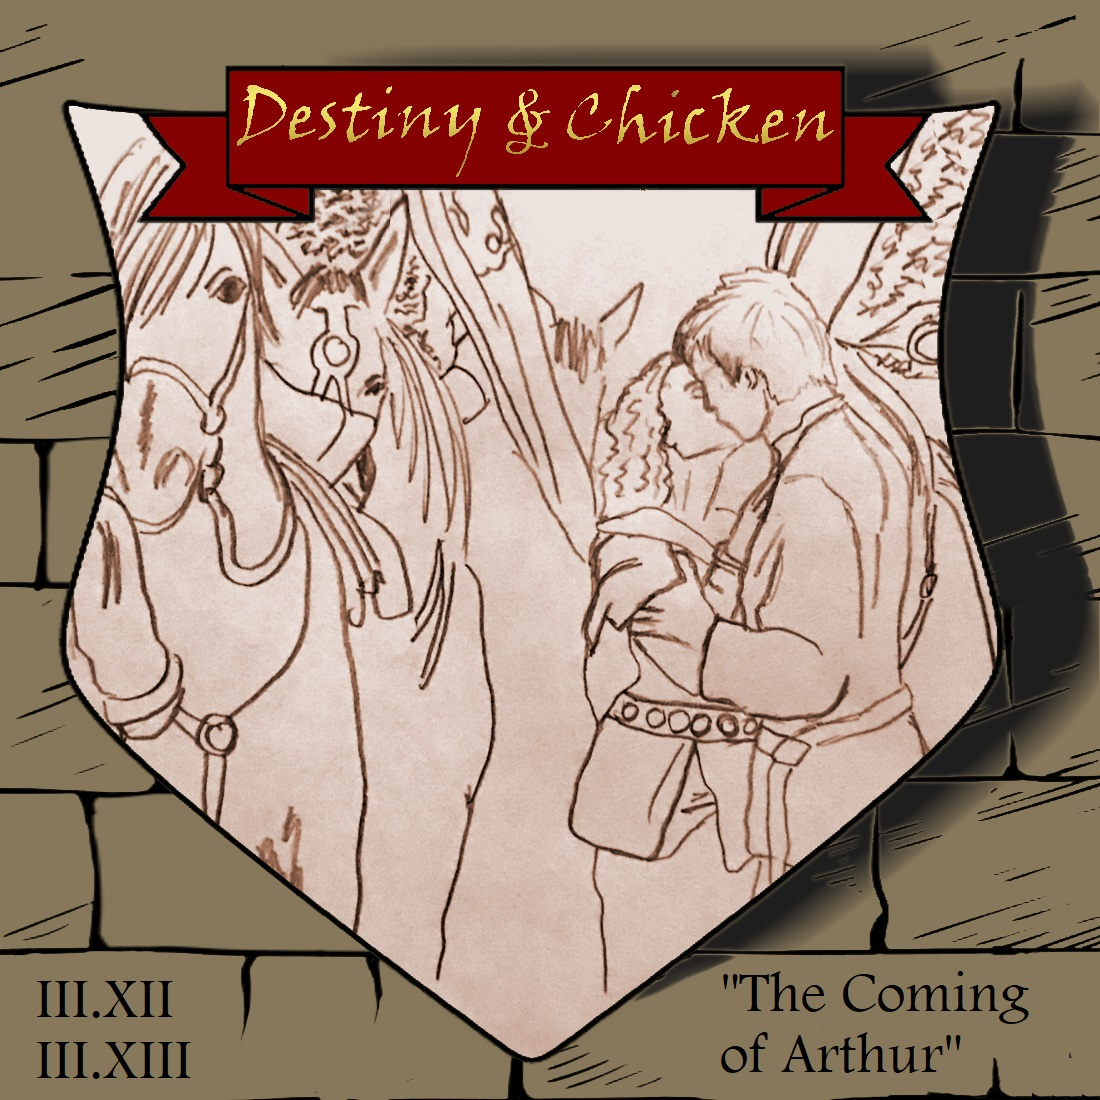 Episode III.XII & XIII - The Coming of Arthur - Part I & II